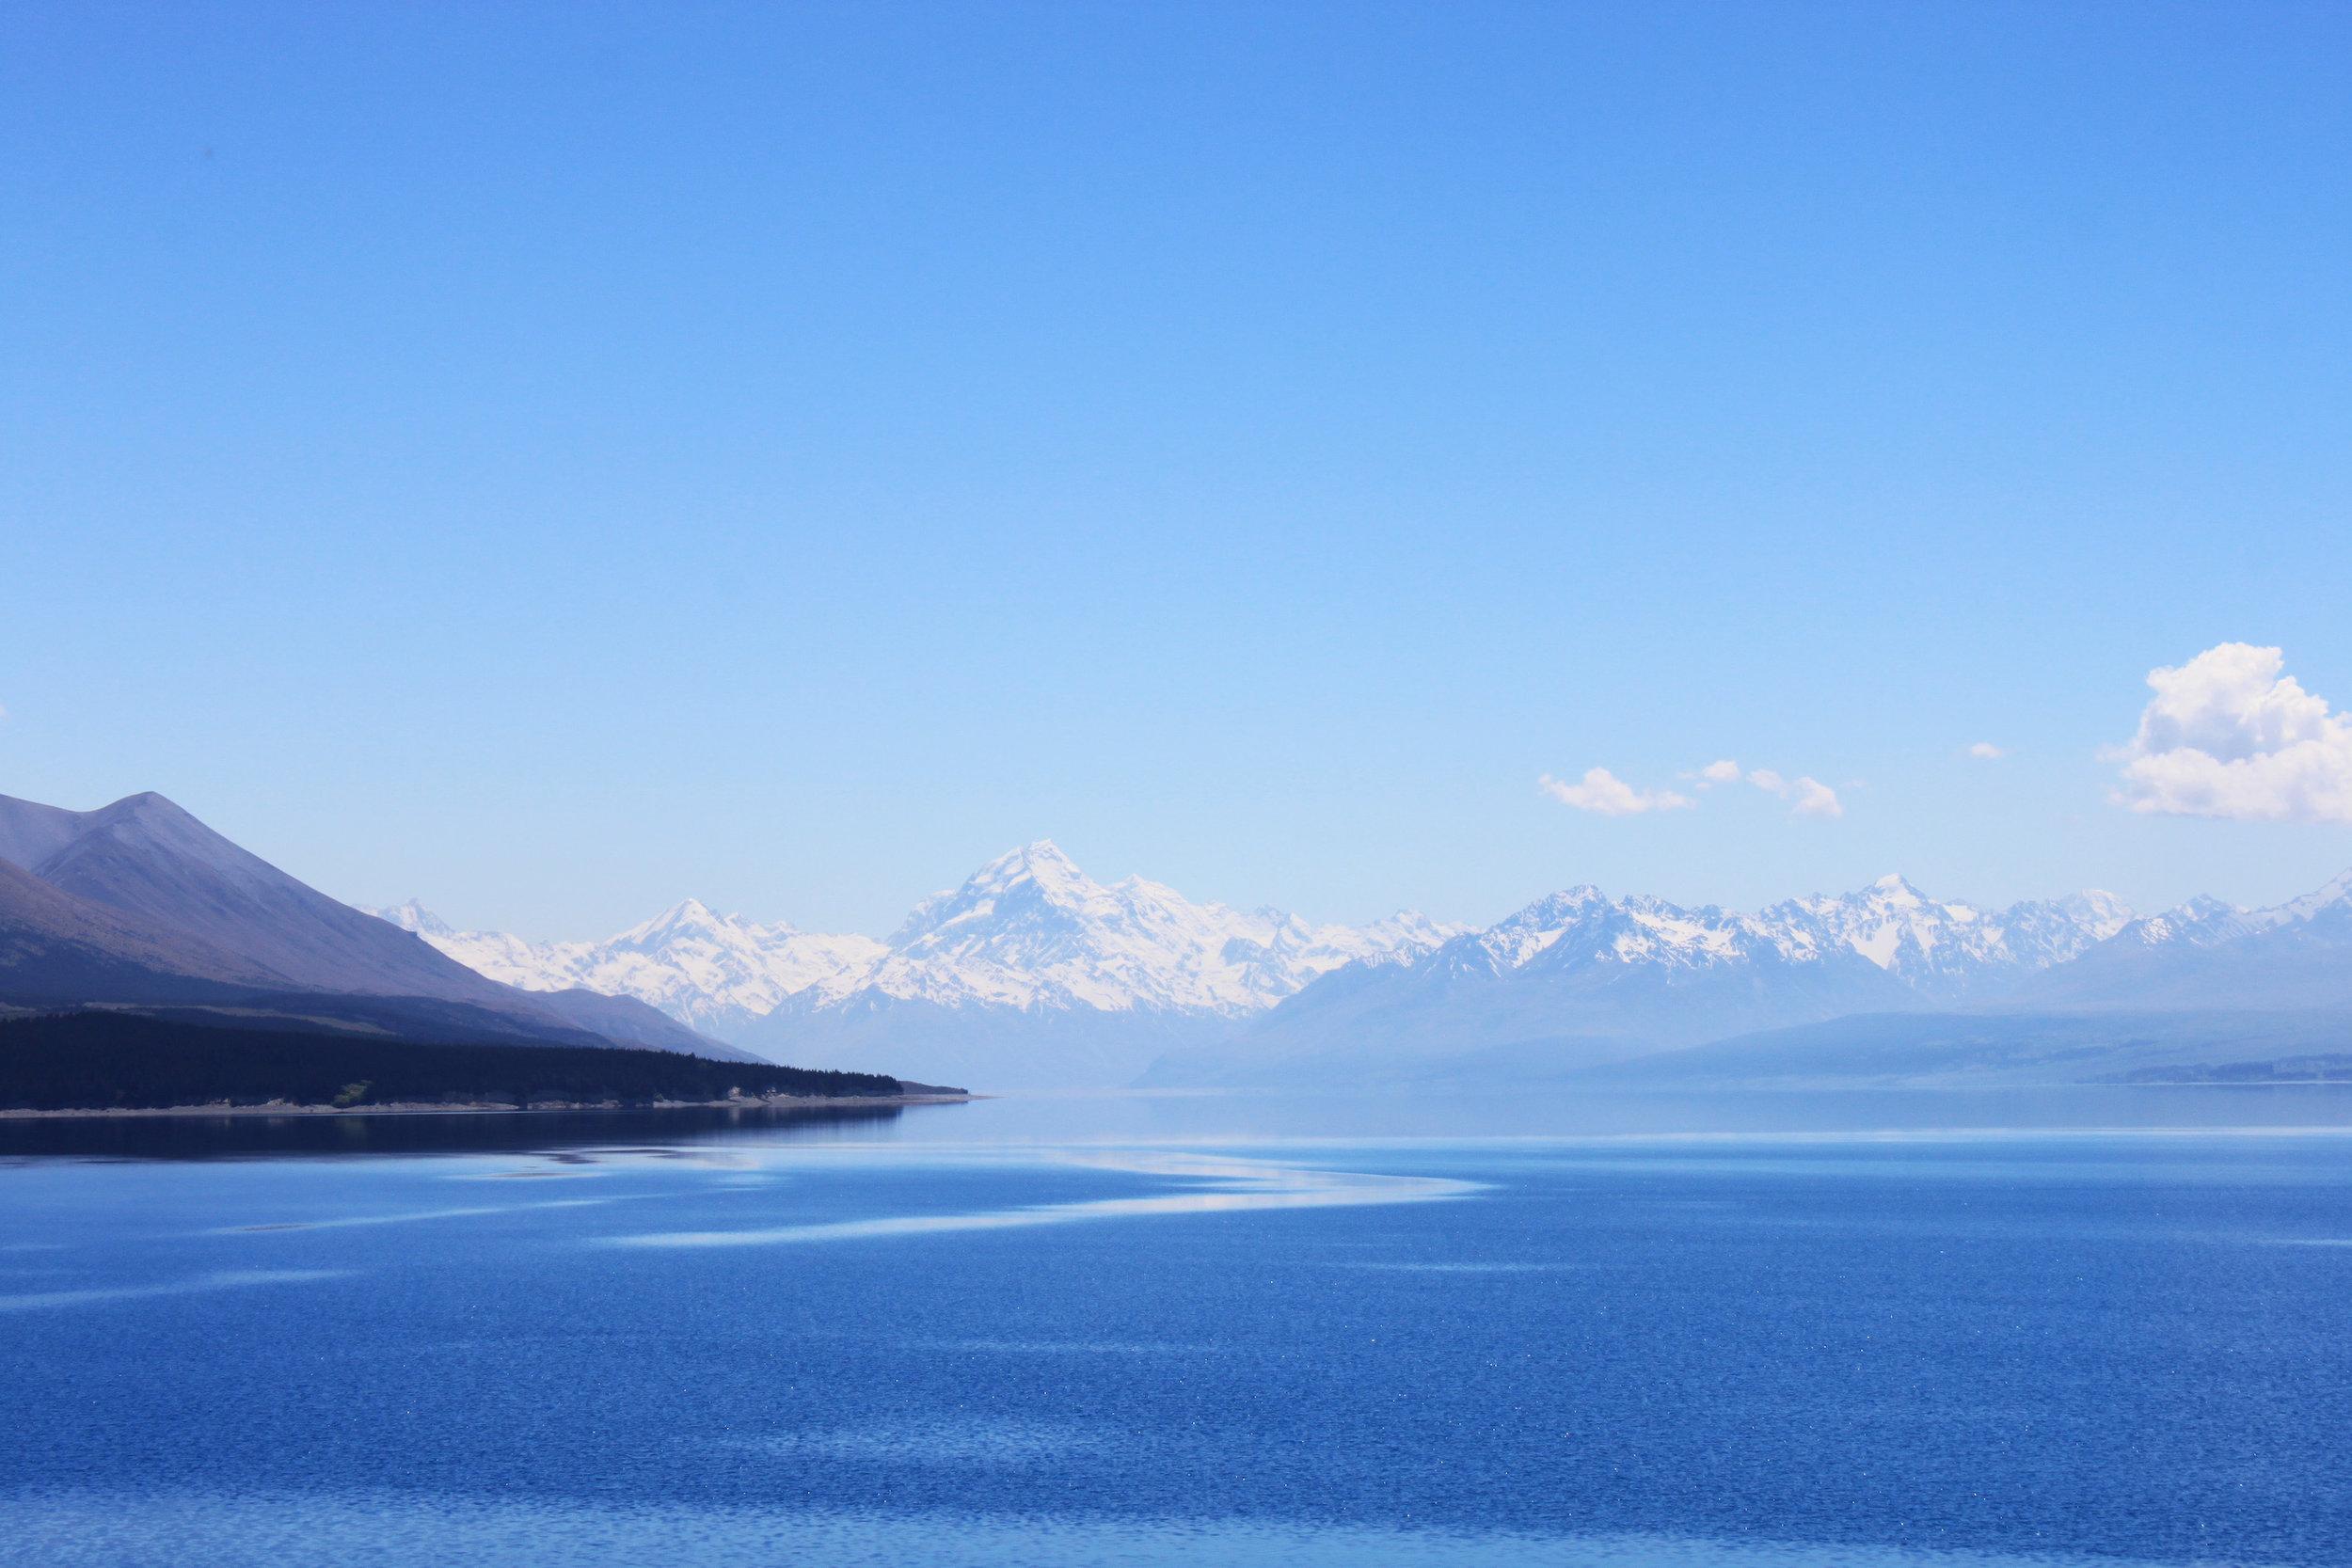 View over Lake Pukaki to Mt Cook